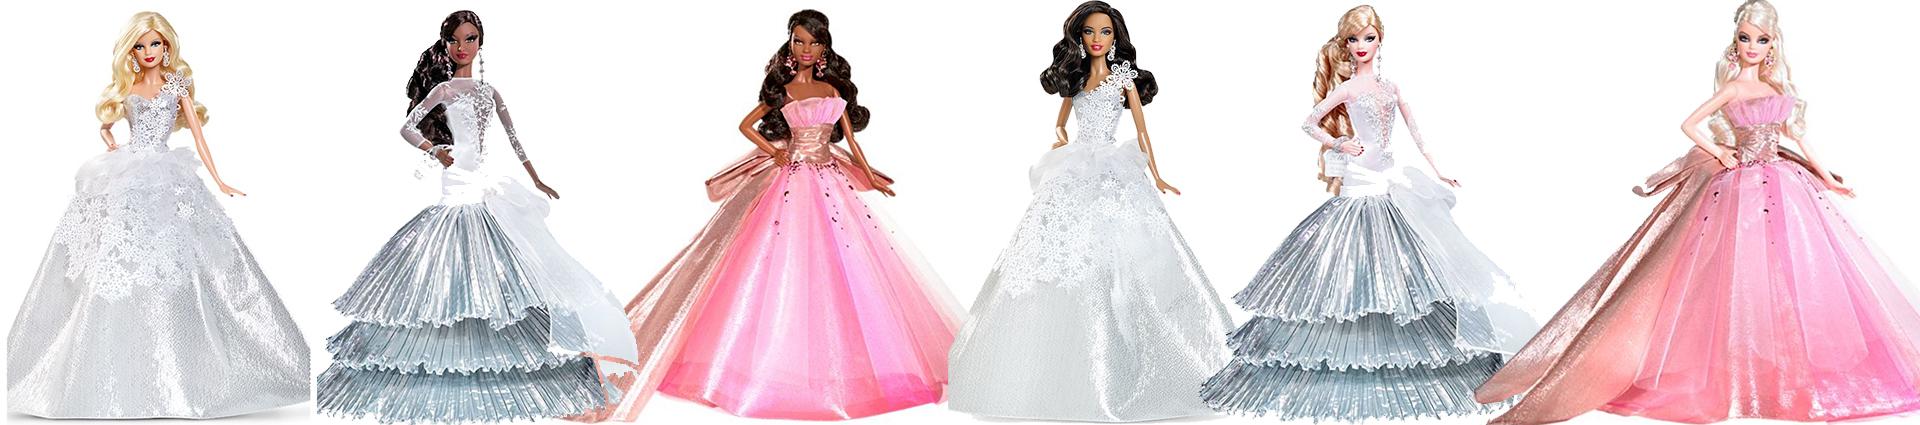 Barbie Holiday Anniversary